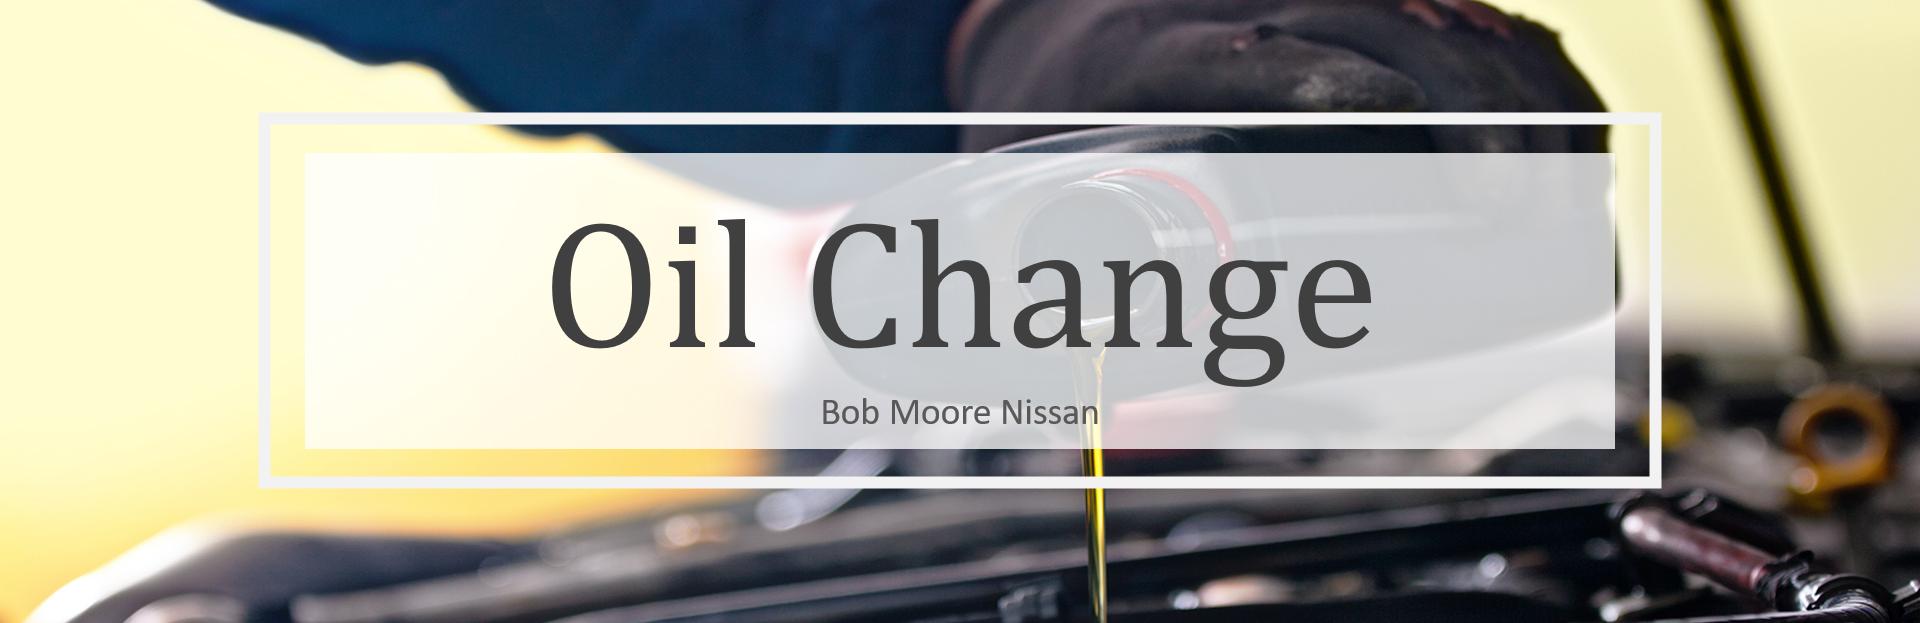 Bob Moore Nissan Oil Chnage